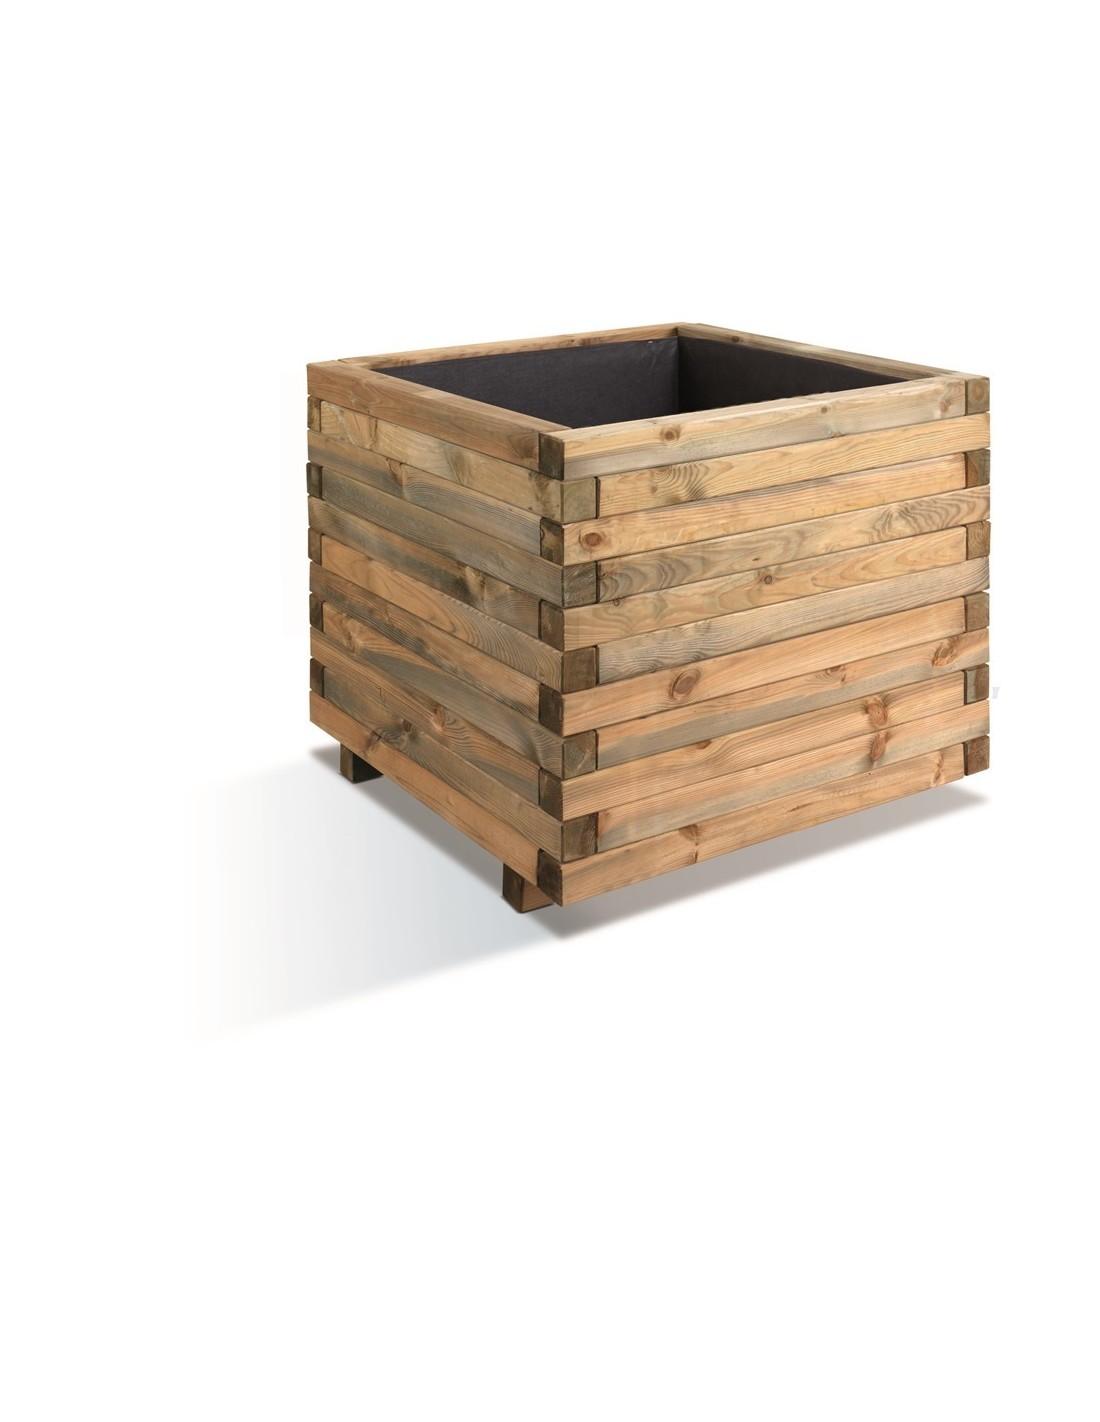 bac carr stockholm bois trait de 100x100 cm. Black Bedroom Furniture Sets. Home Design Ideas